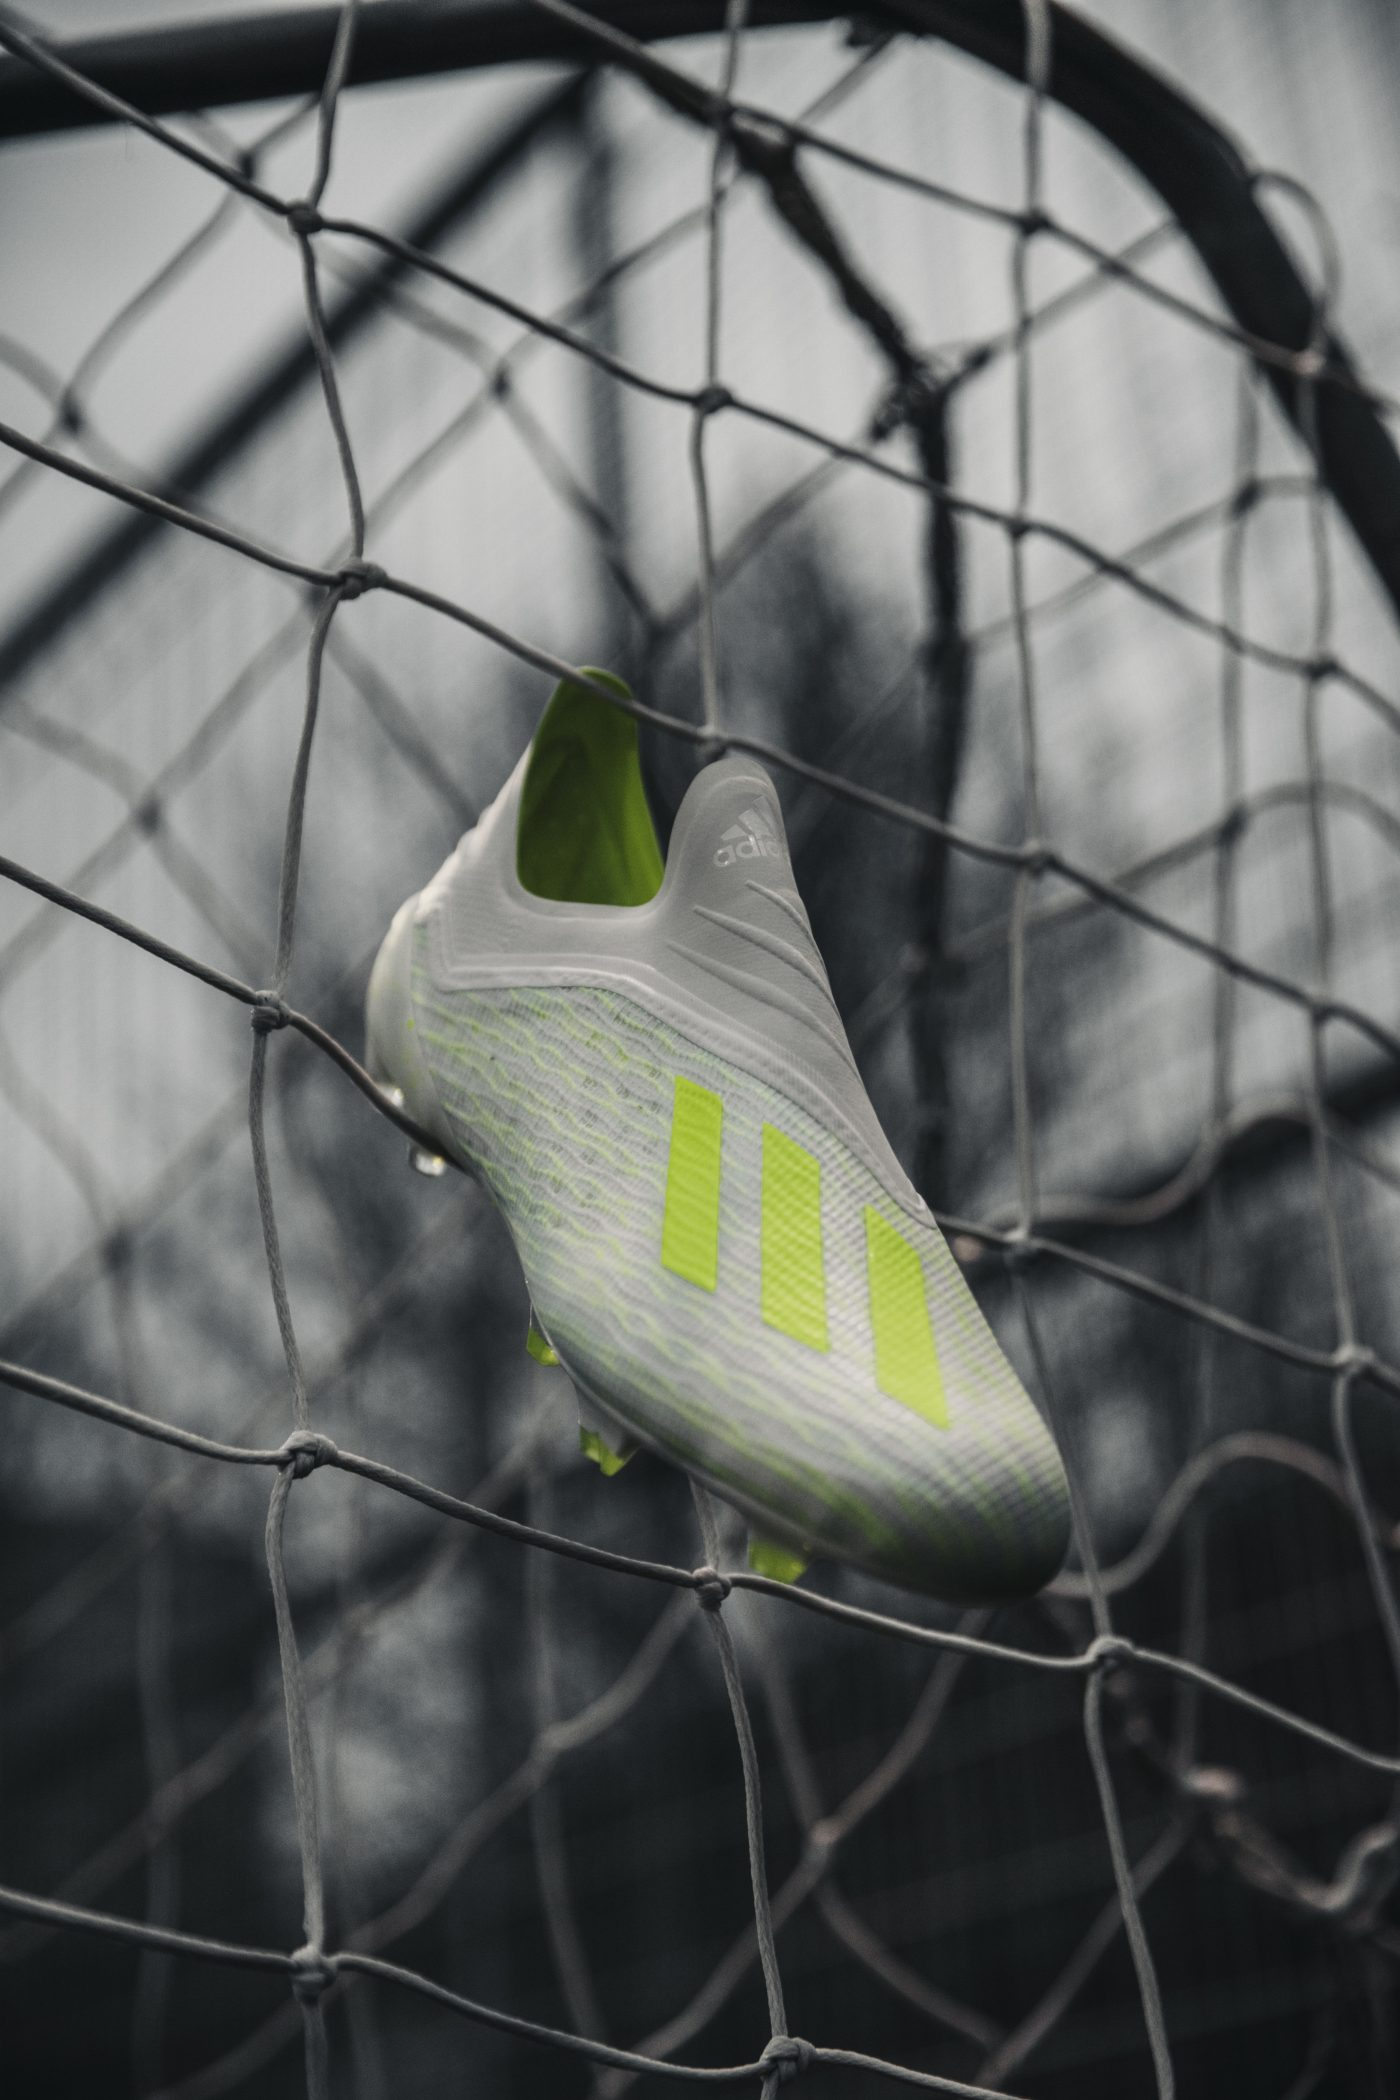 adidas-x-18-pack-virtuso-2